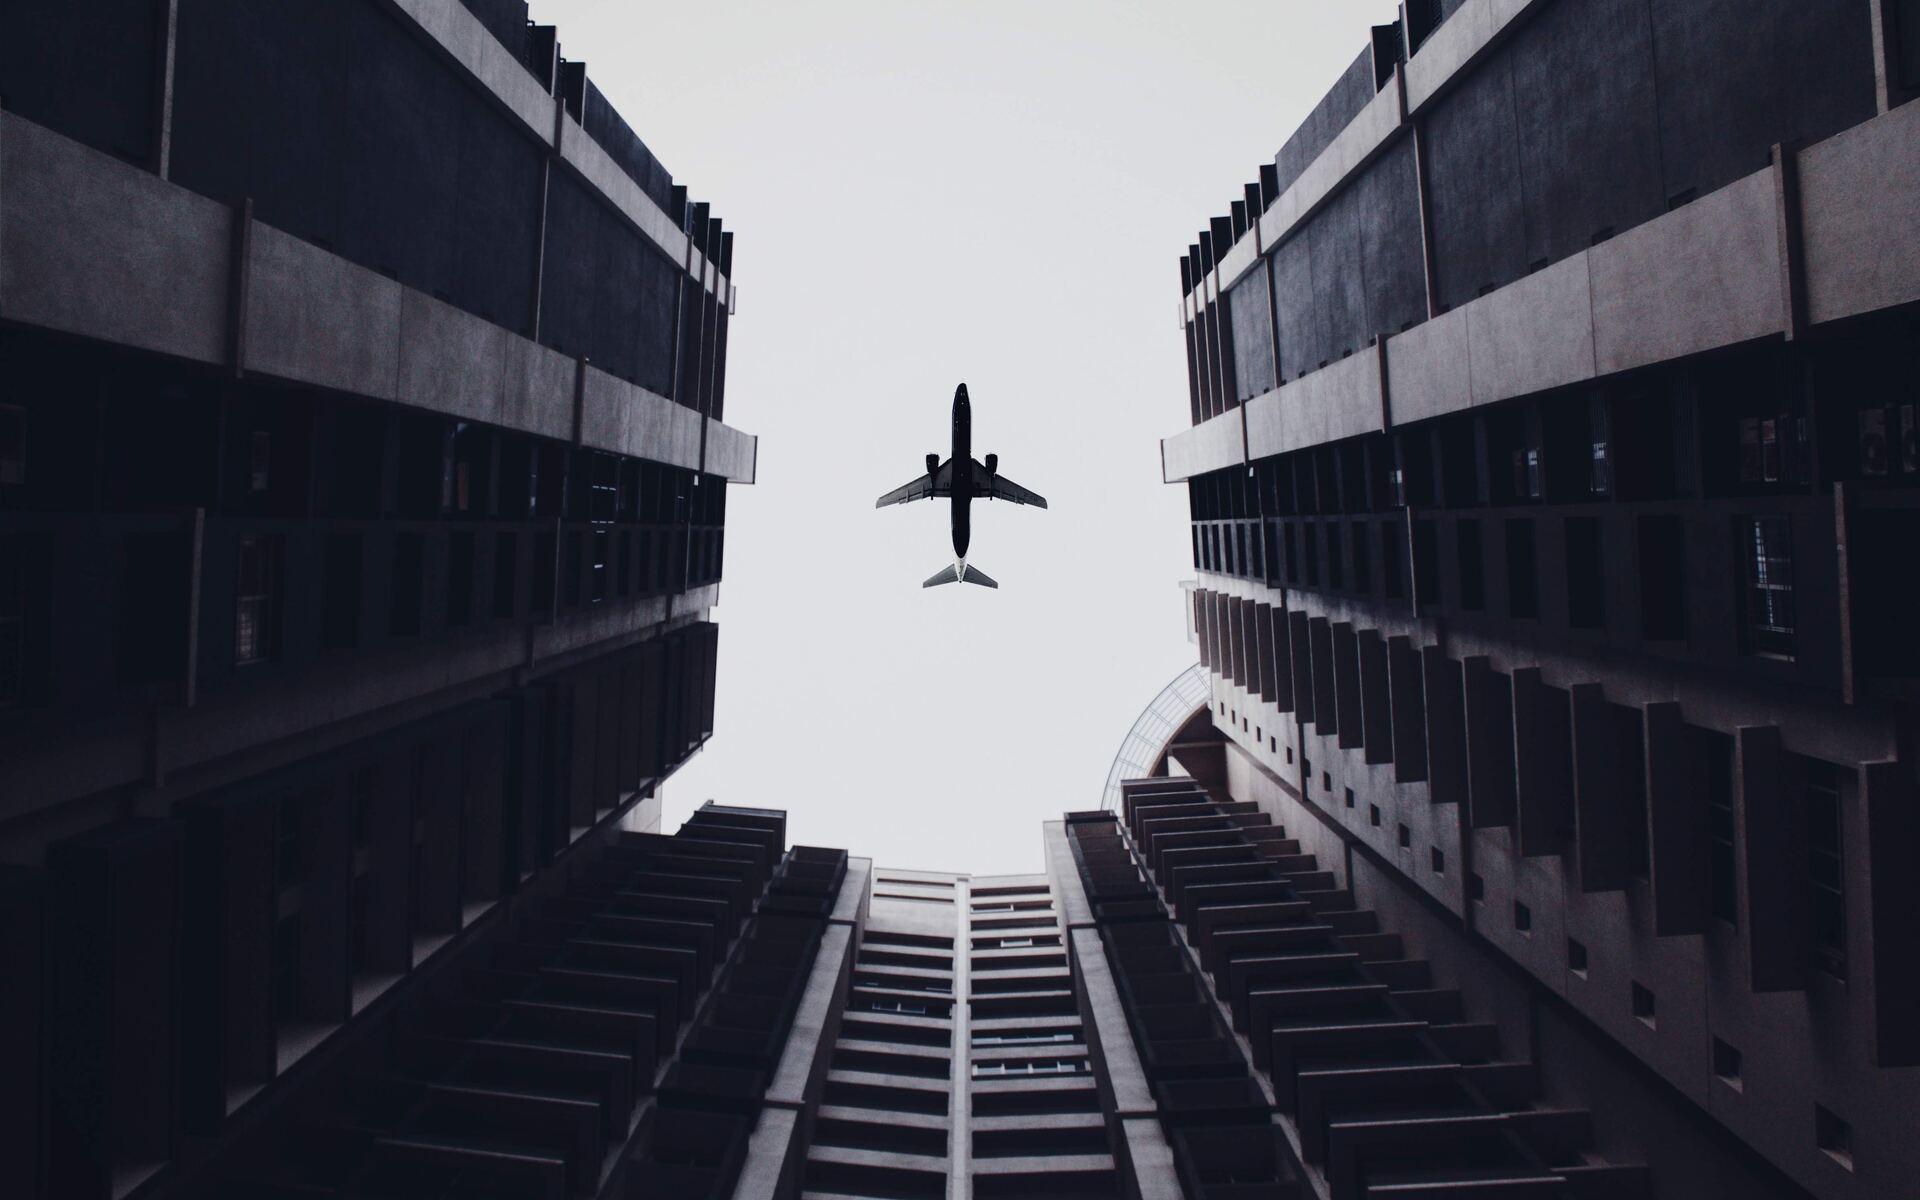 airplane-flying-above-the-buildings-5k-7t.jpg